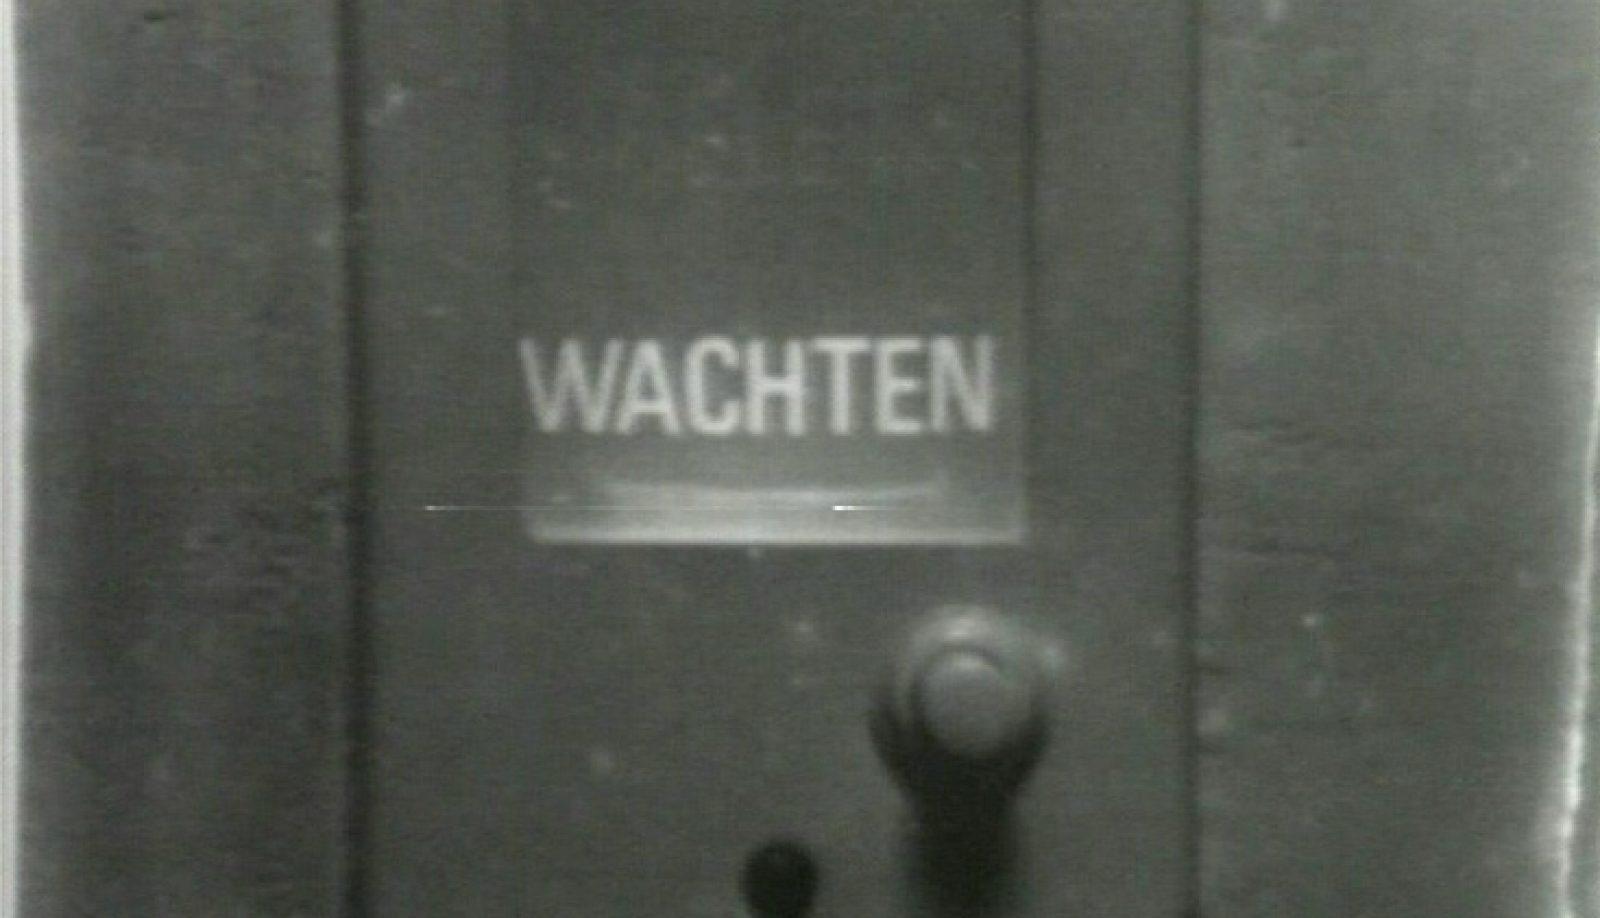 Daniël Dewaele, (Geduld) Wachten, Attendre, Wait, Warten (1977). © the artist.